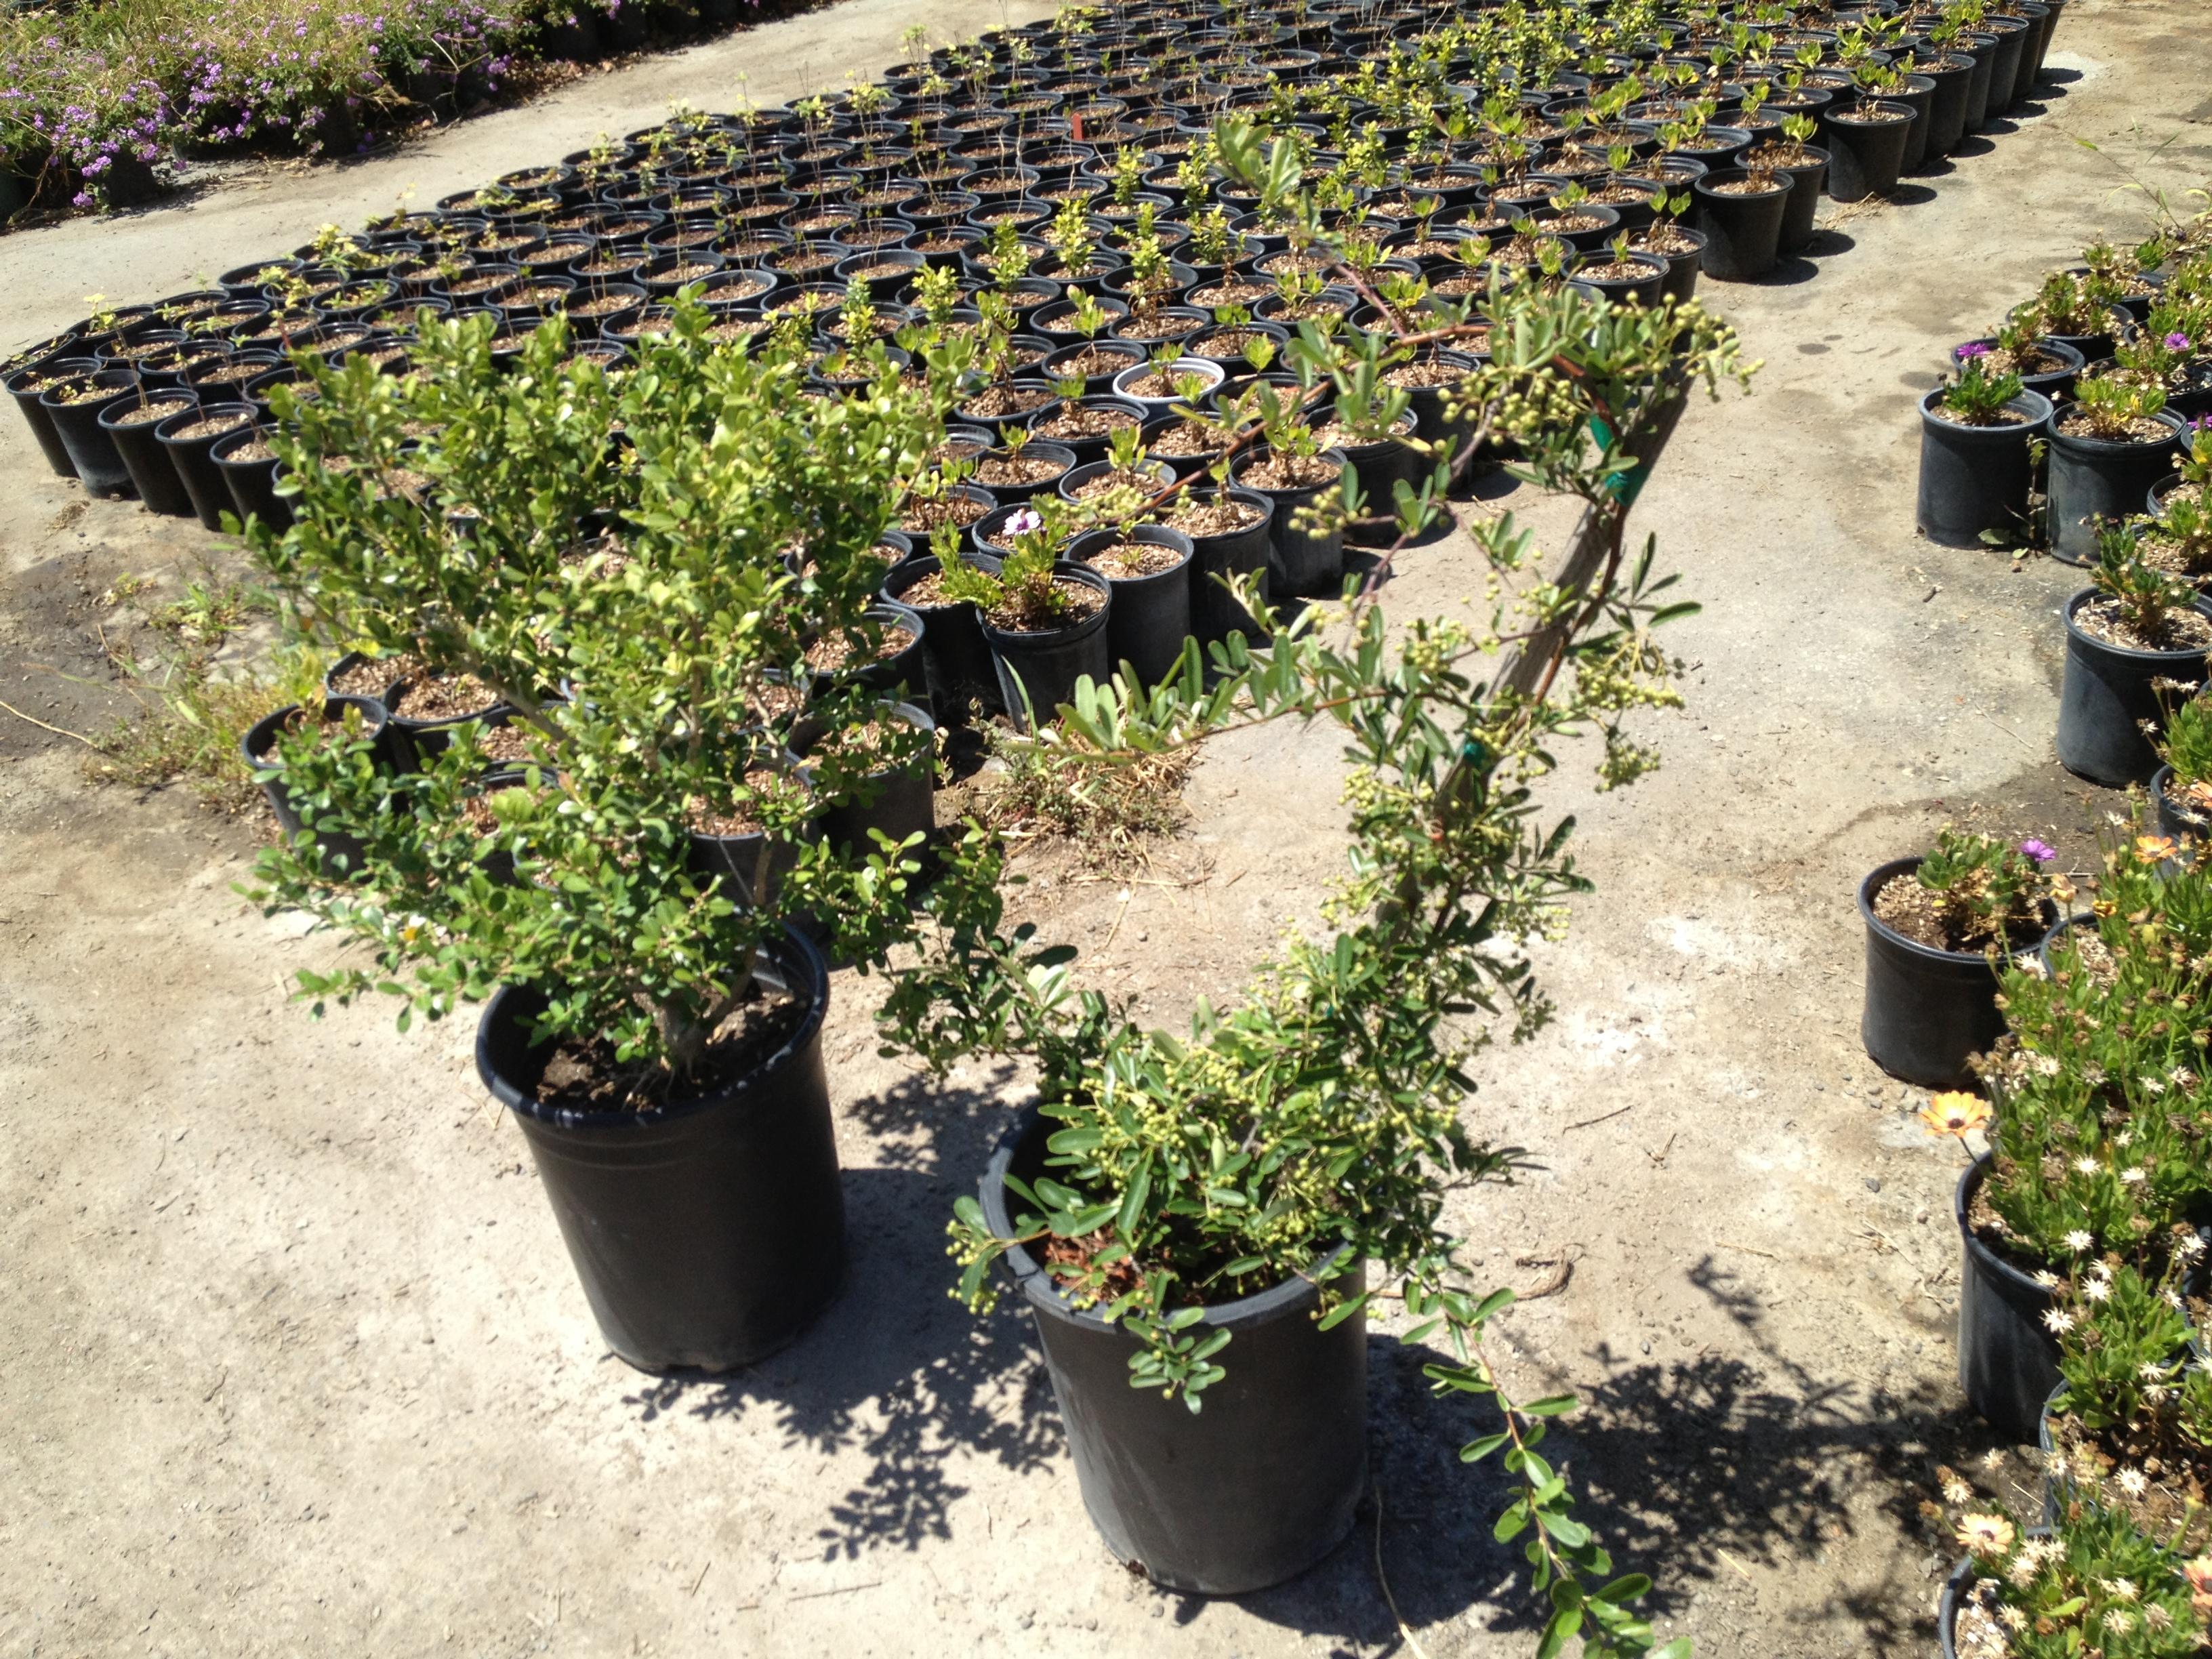 Selecting Good Nursery Stock To Grow As Bonsai The Bonsai Dilettante